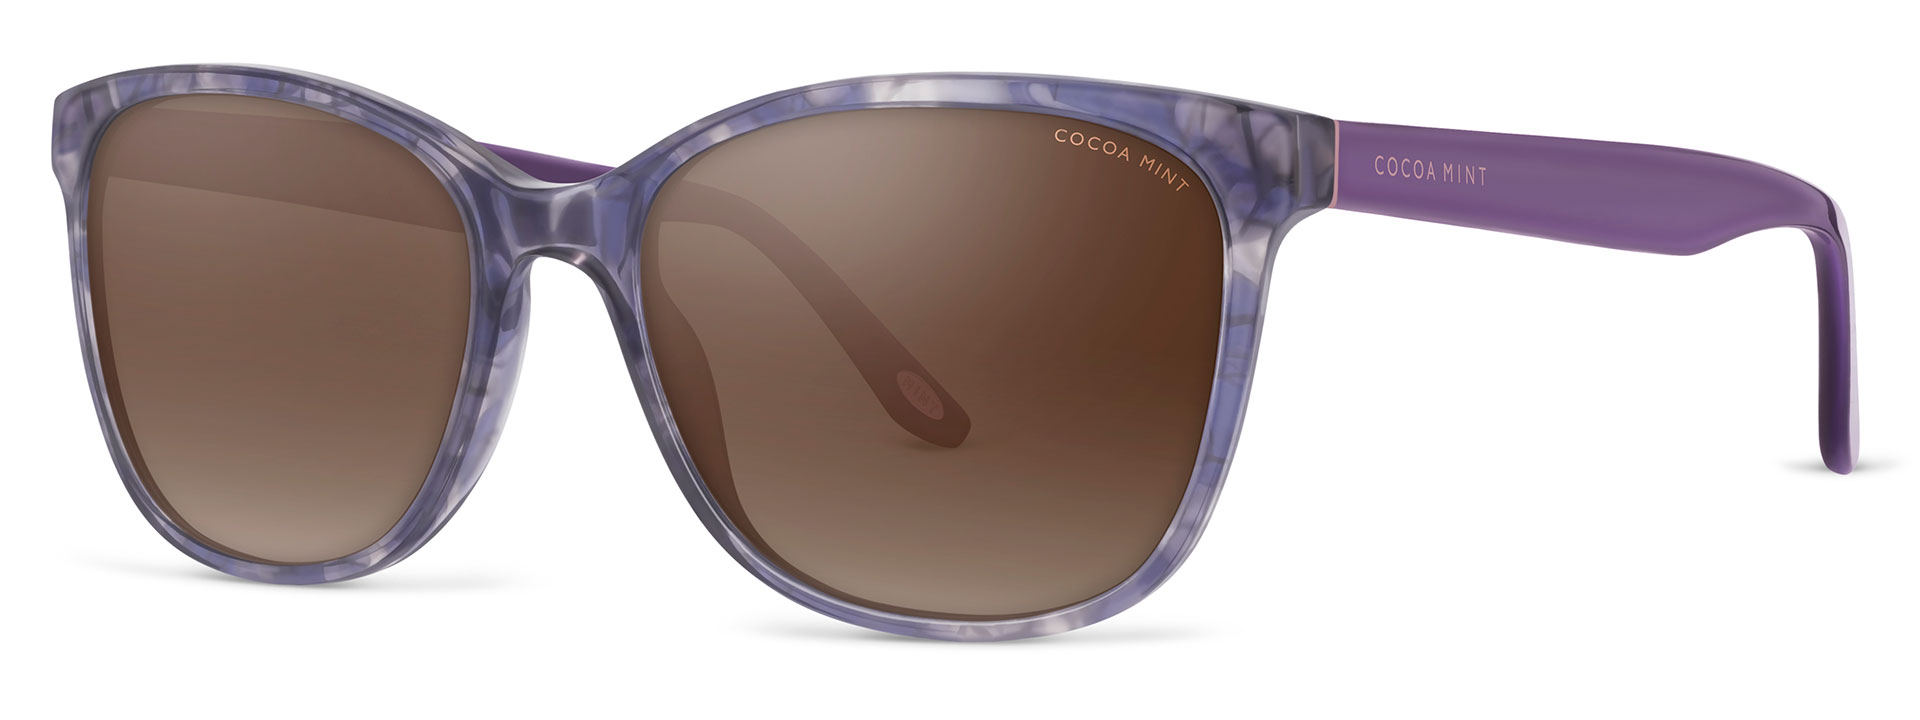 Cocoa Mint Sun Glasses - Lilac - CMS2064-C1